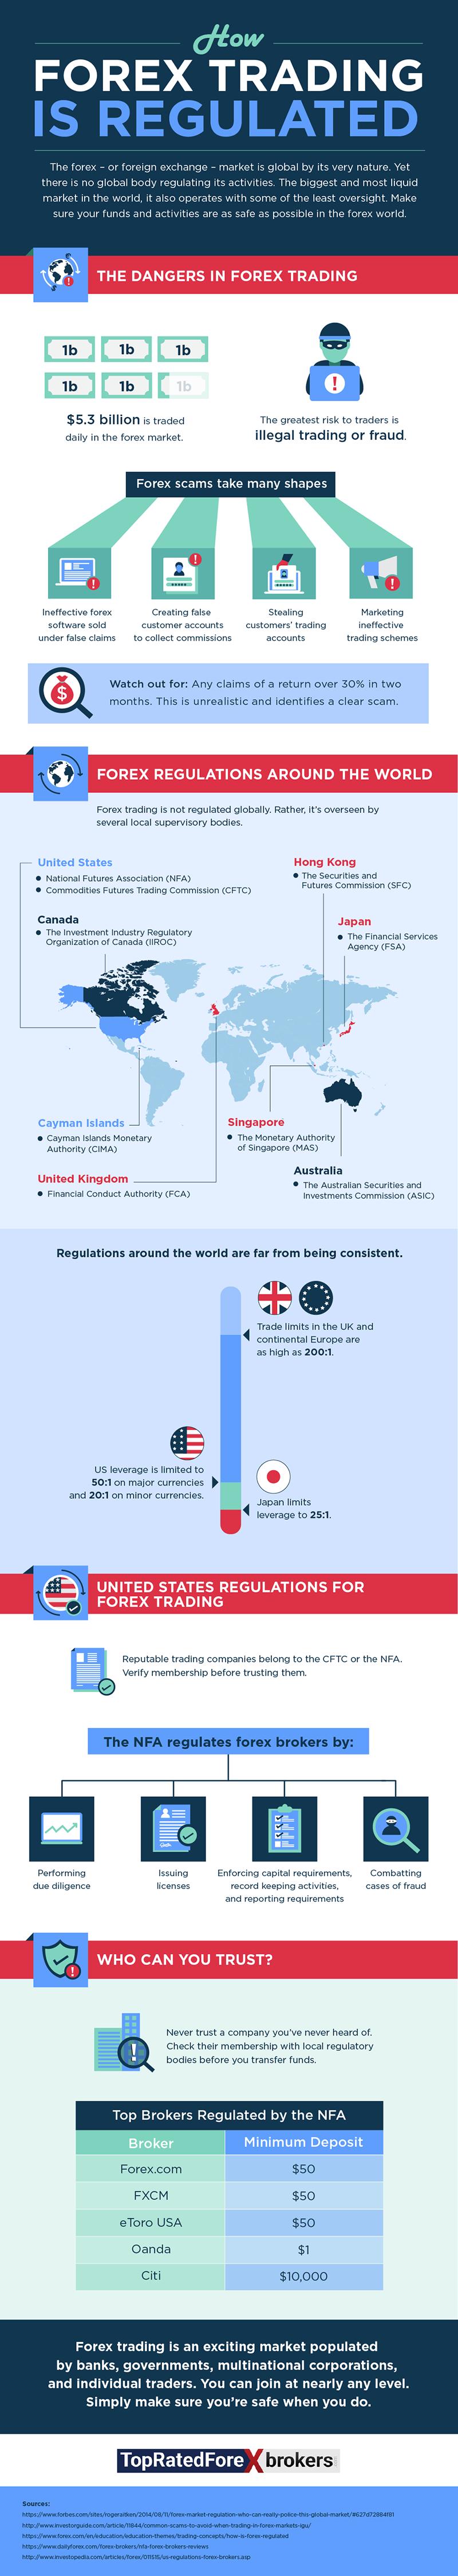 Forex trading around the world